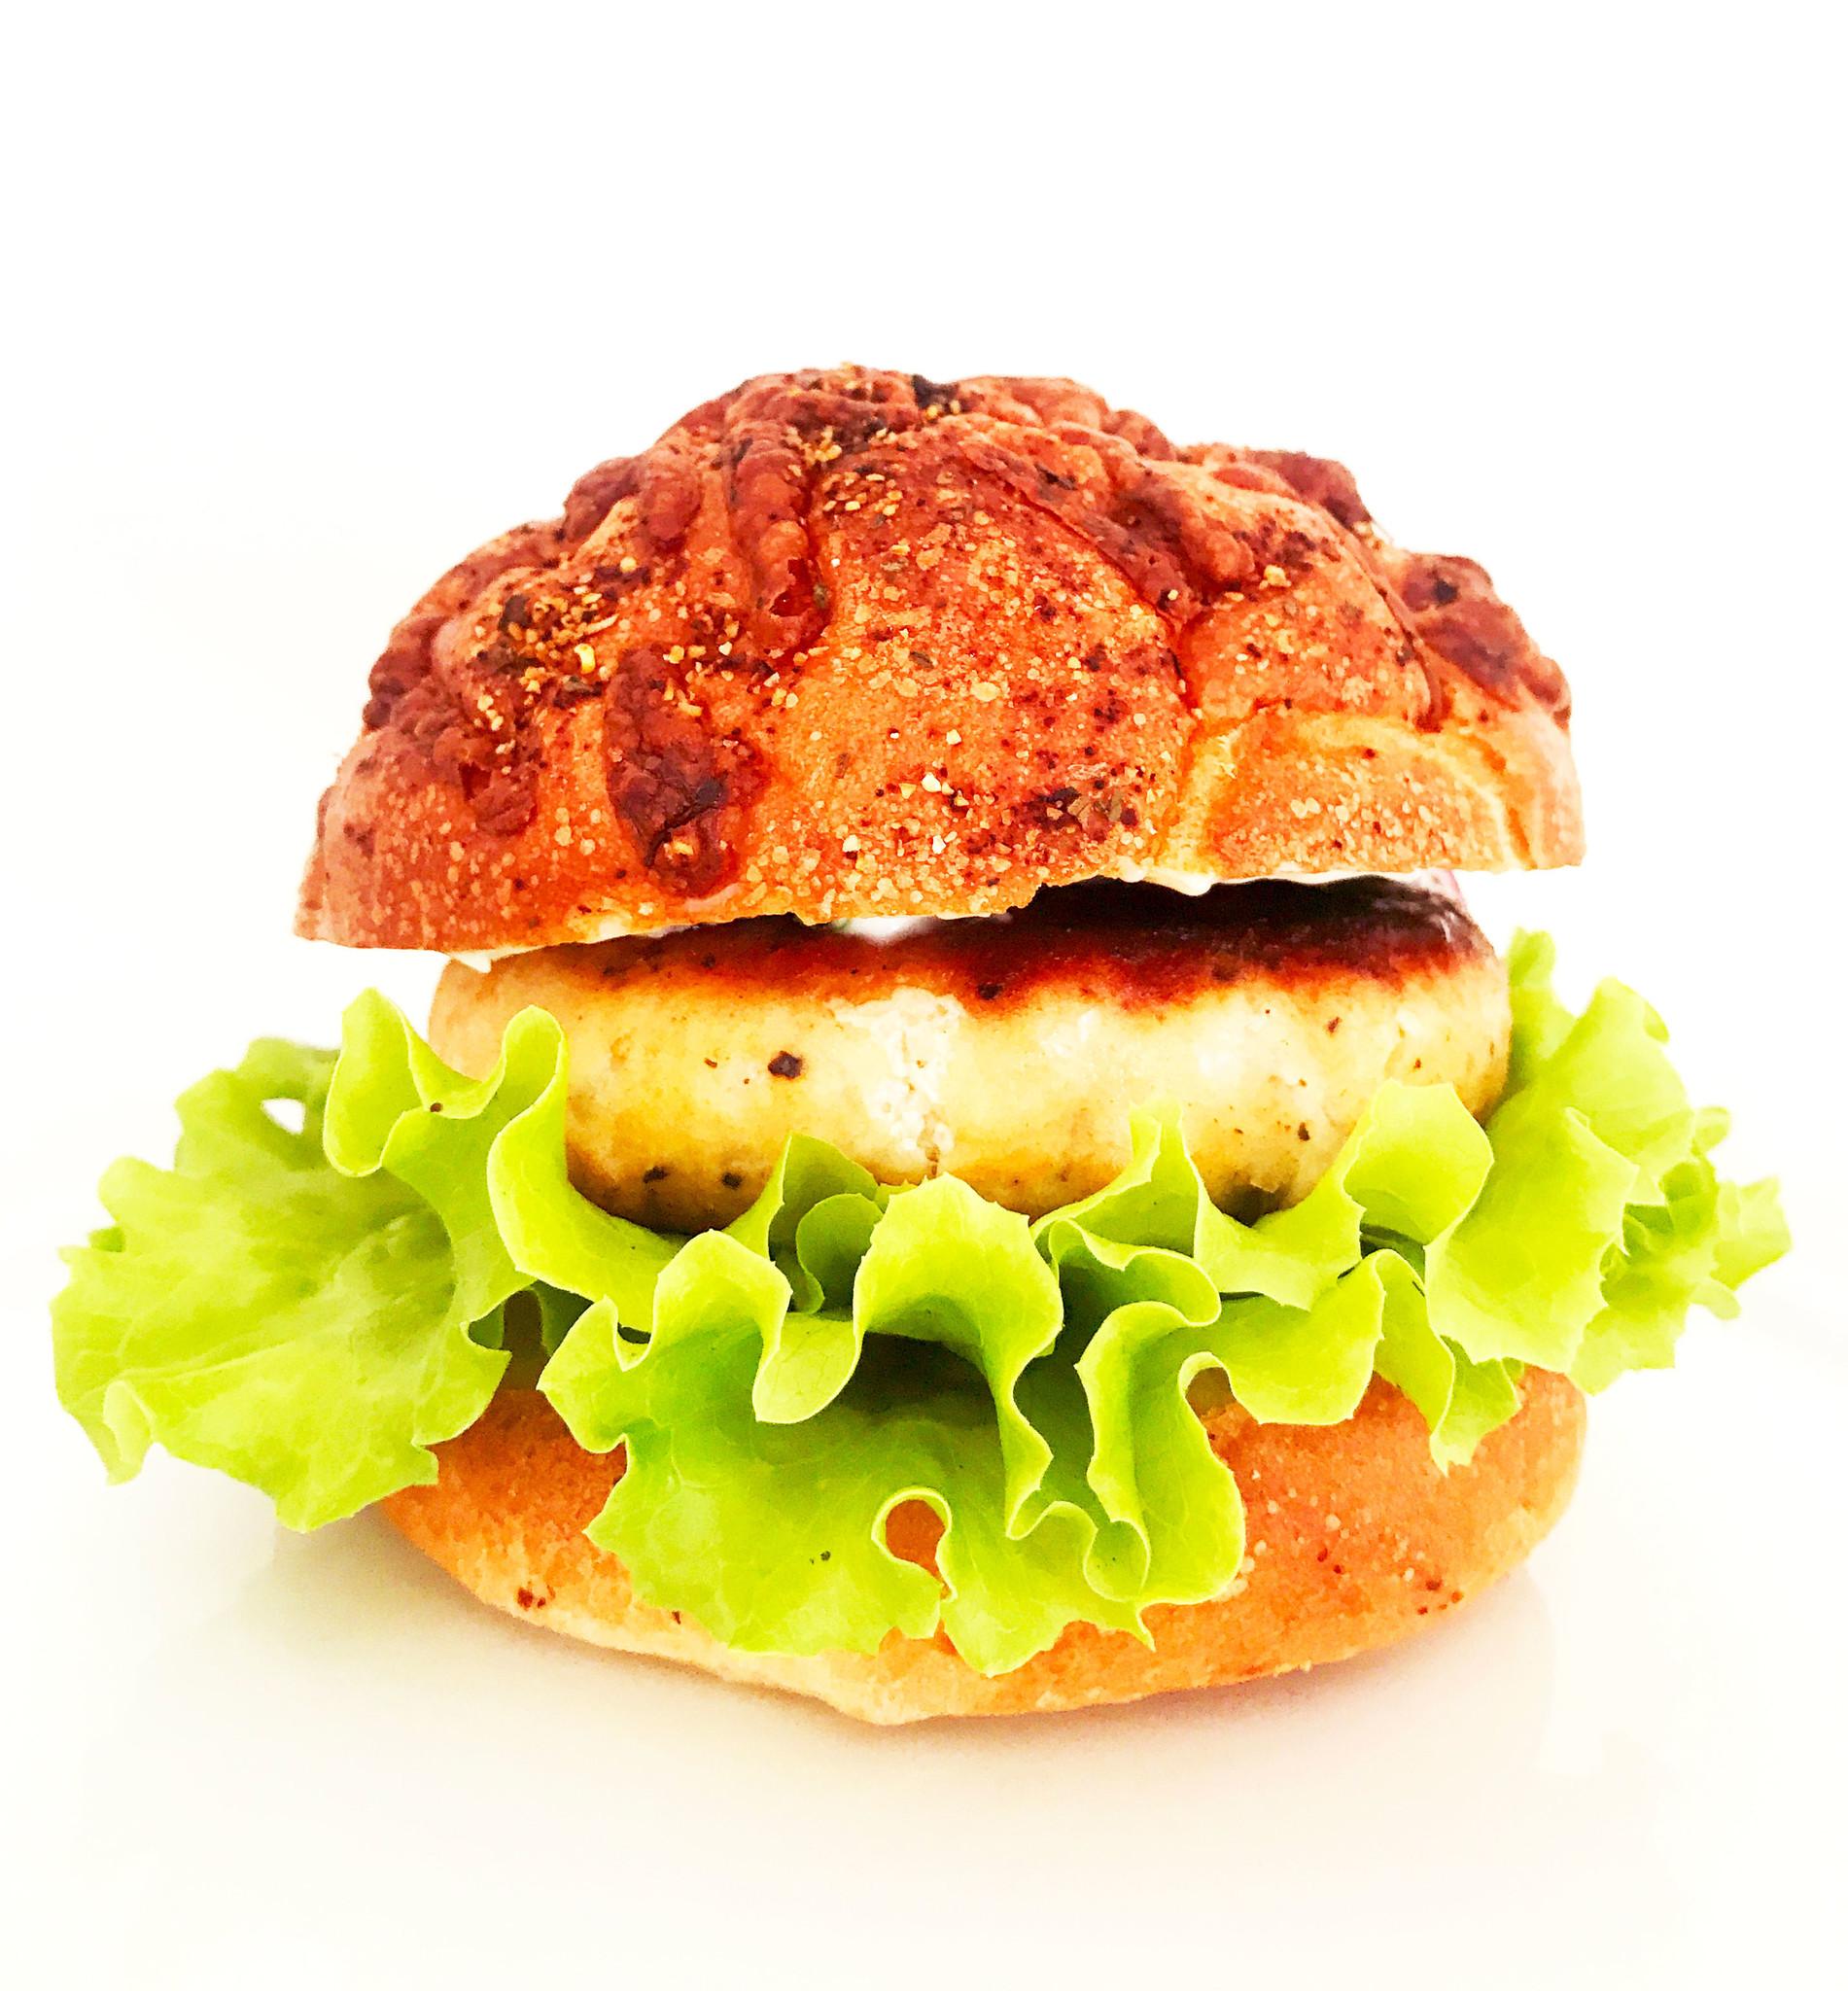 Burger de saumon, câpres & raifort